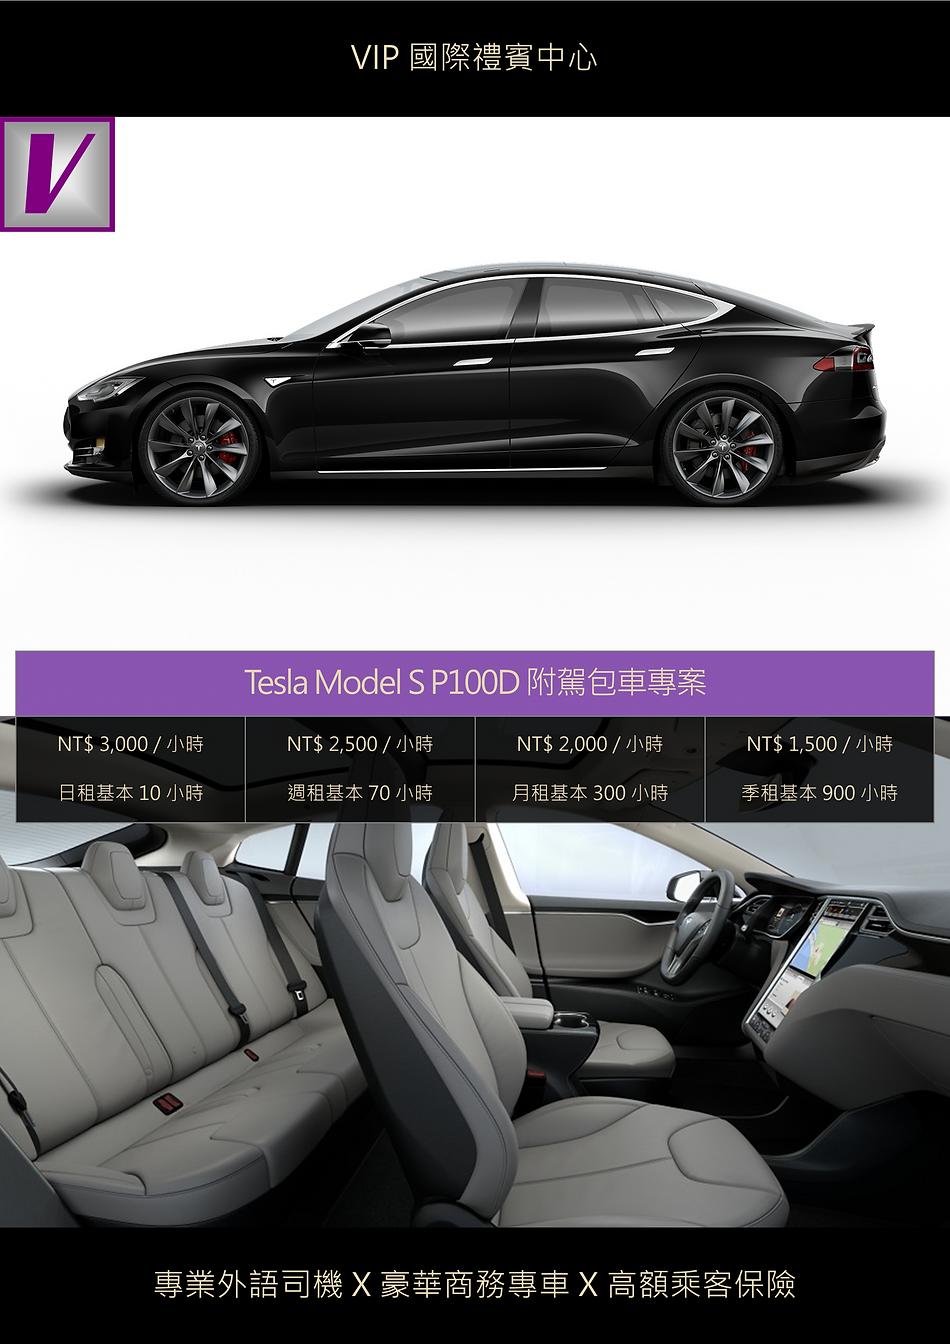 VIP國際禮賓中心 TESLA MODEL S P100D BLACK 附駕包車專案 DM.png